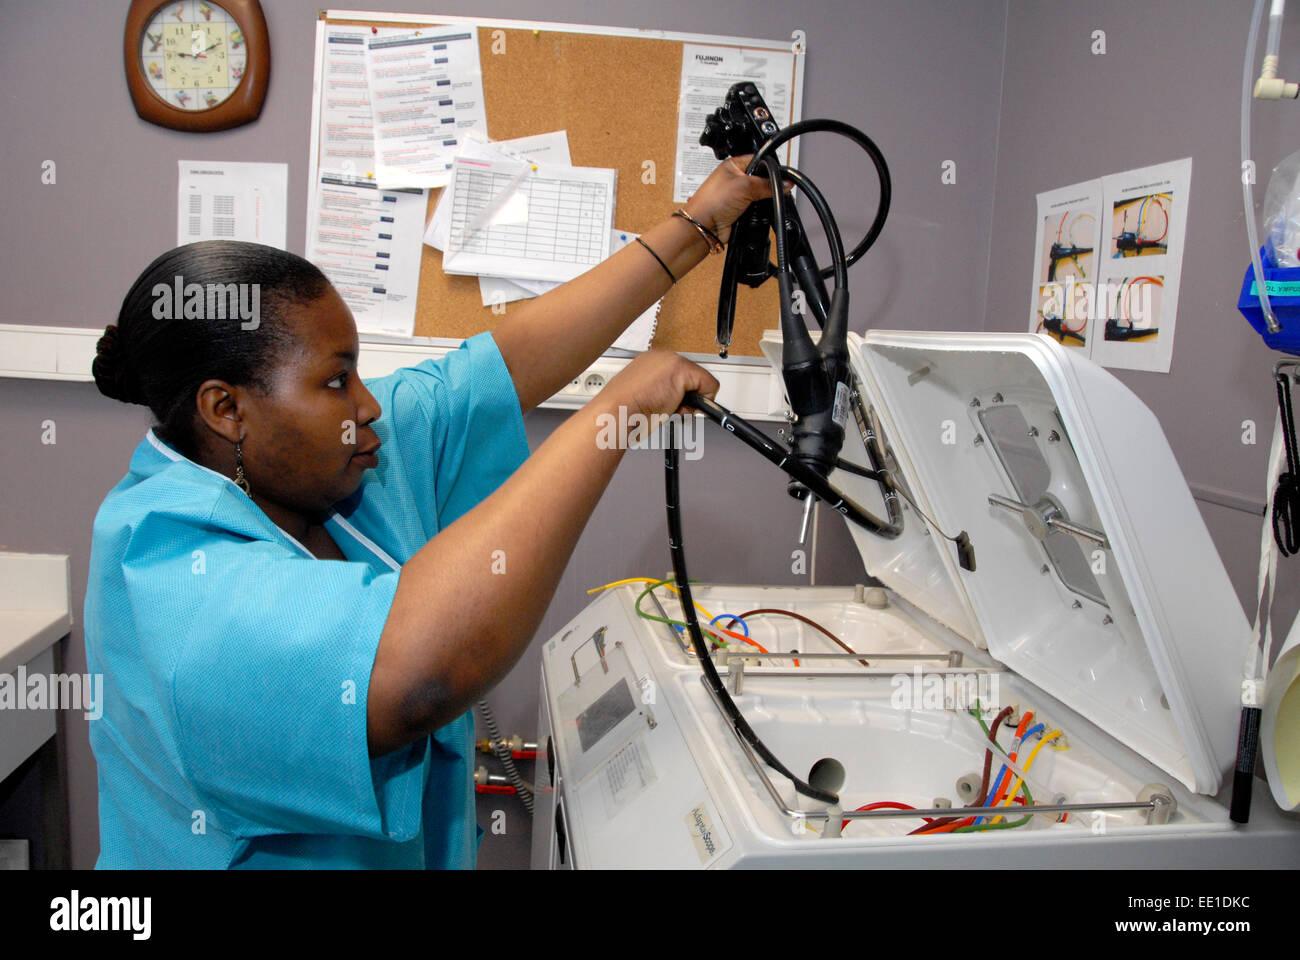 medical equipment technician